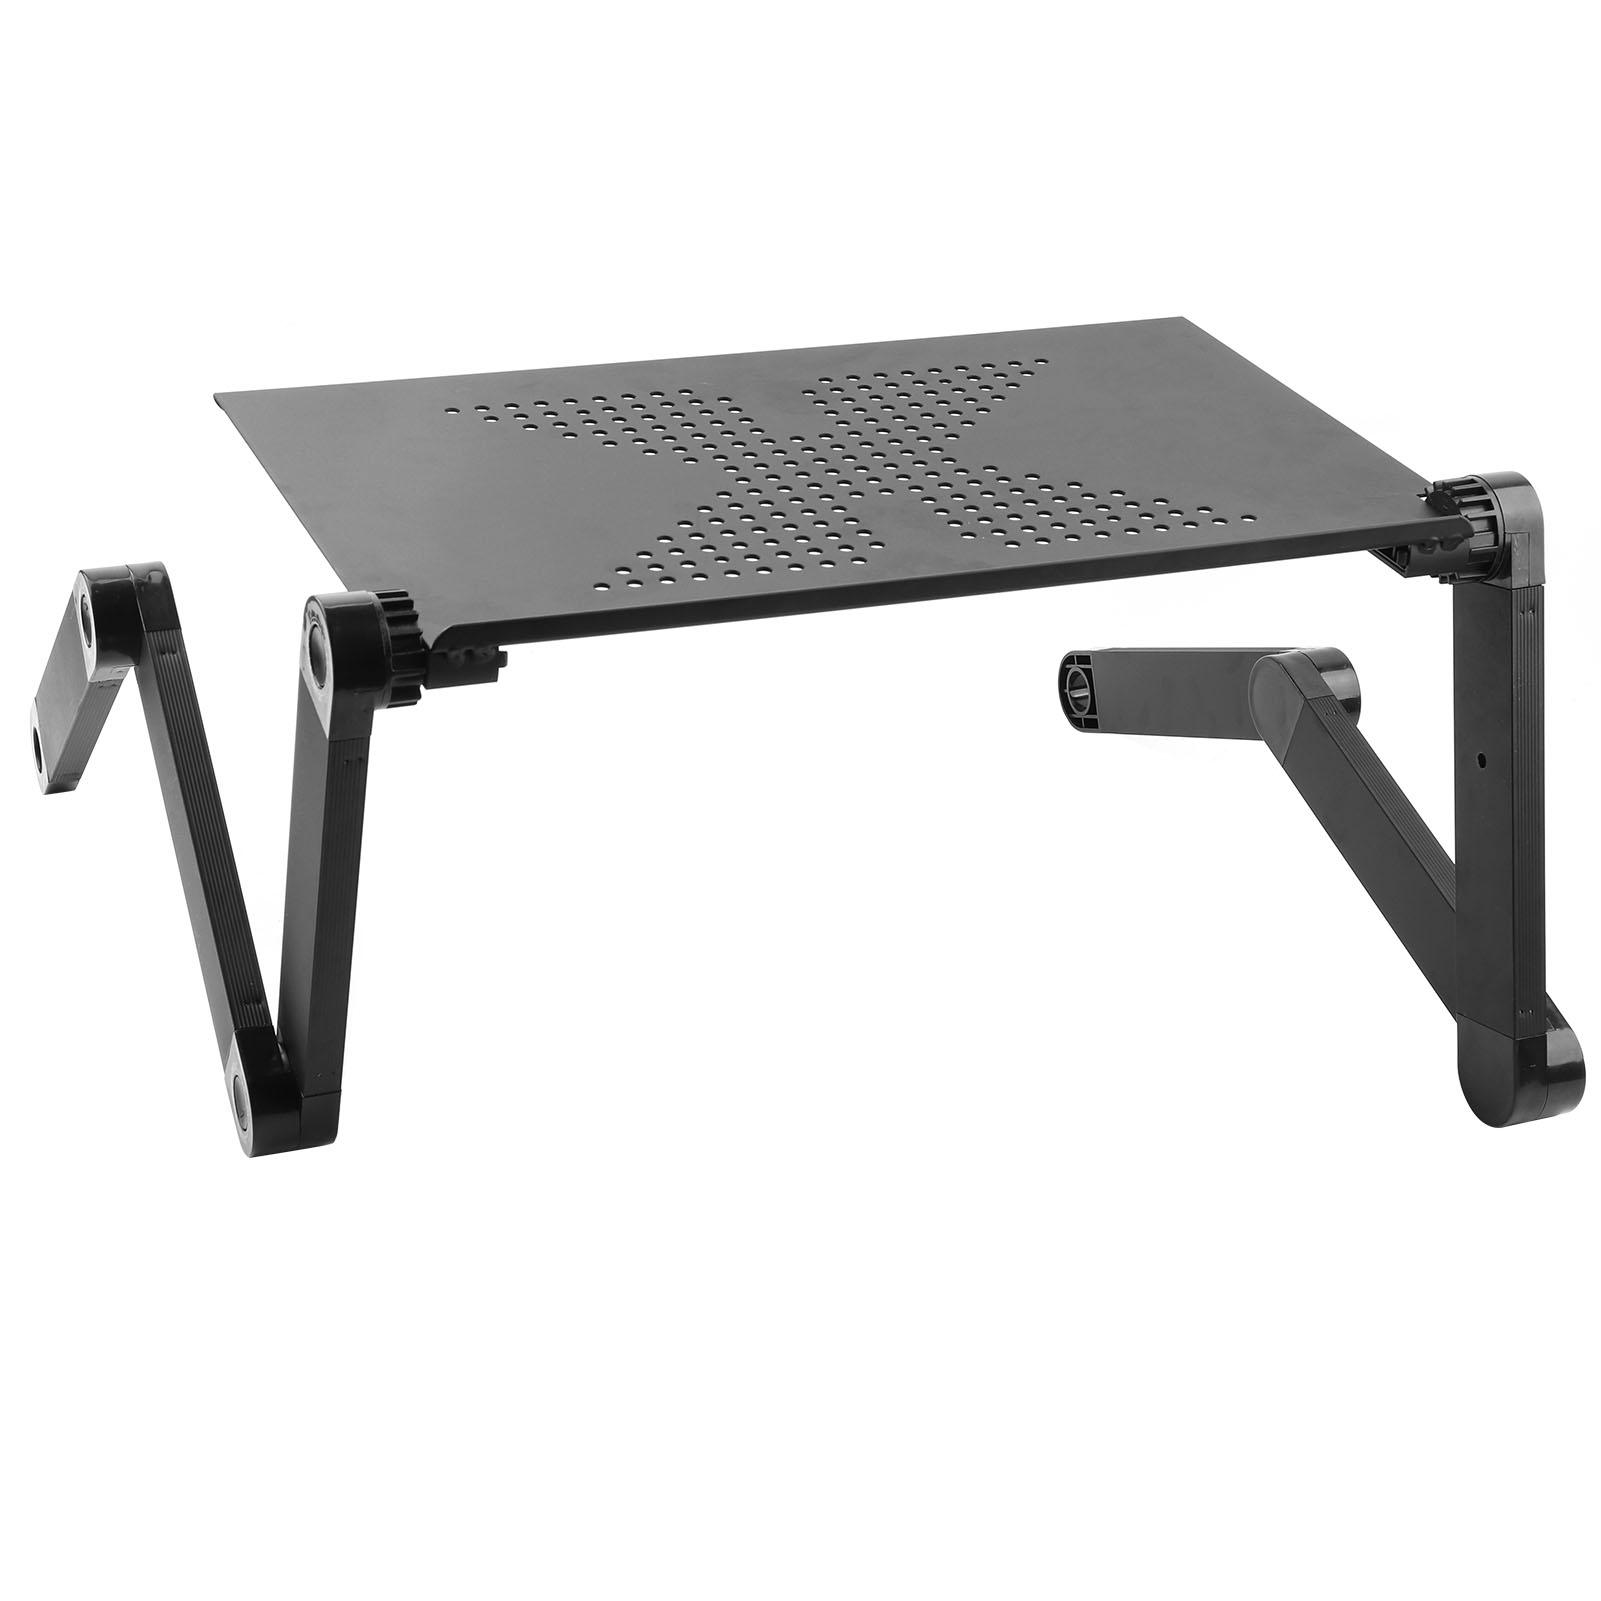 plegable soporte de mesa table bandeja para mesita de cama On soporte para mesa plegable